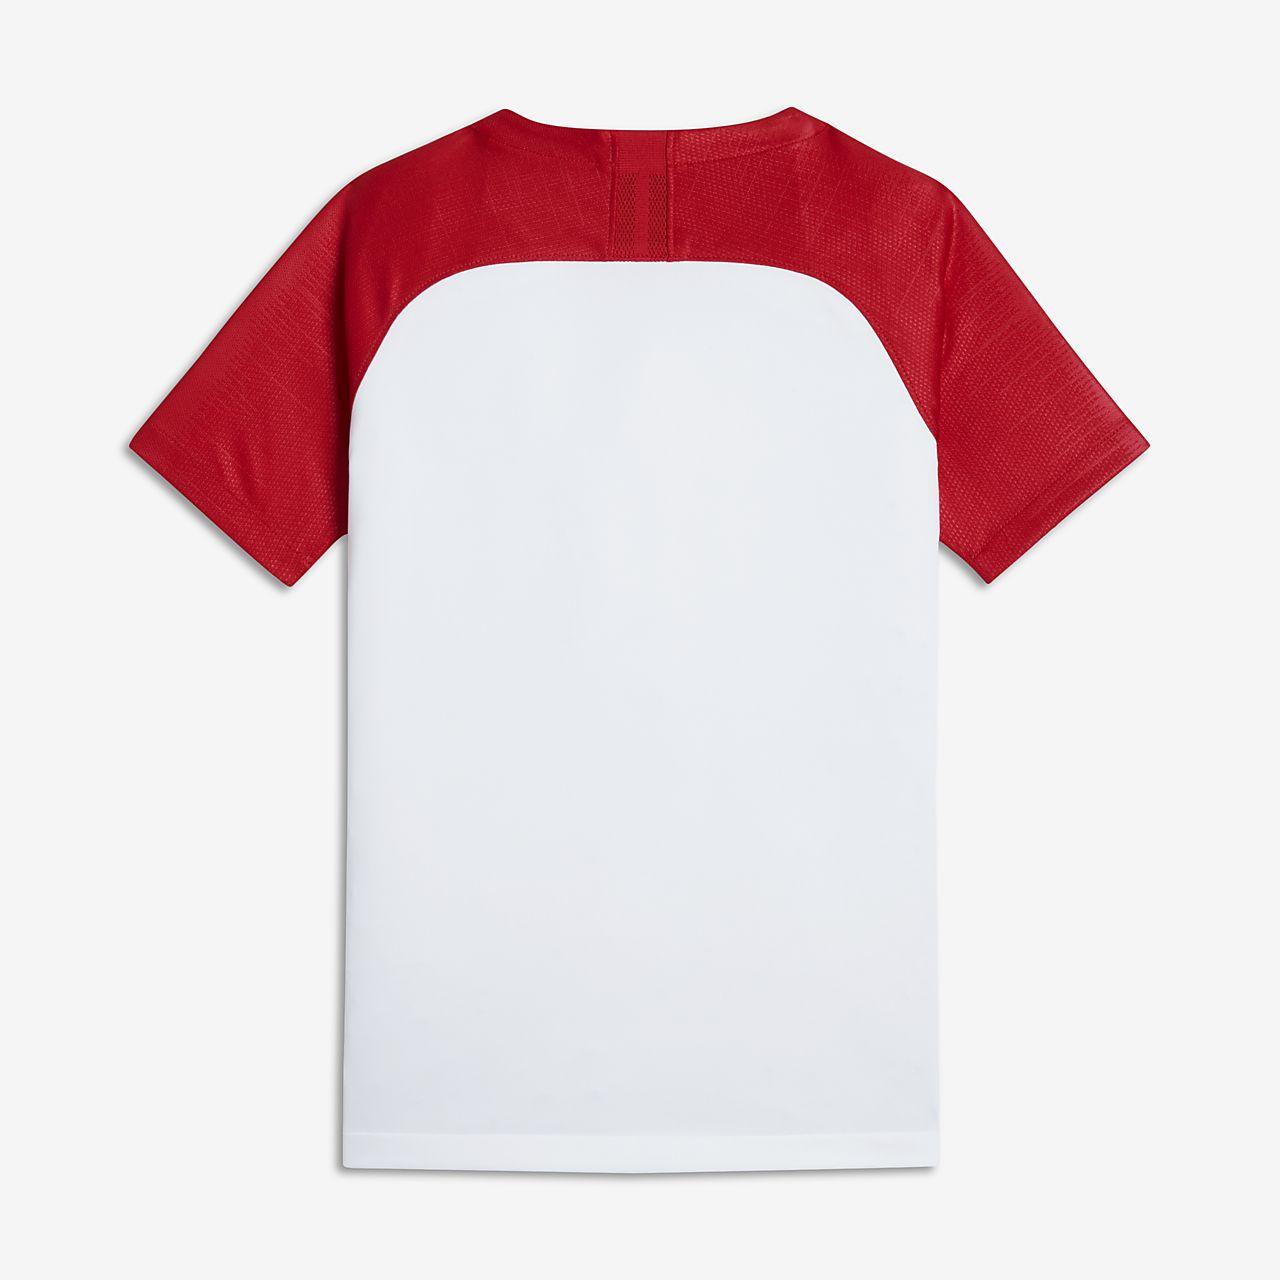 04b7188ab 2018 Croatia Stadium Home Older Kids  Football Shirt. Nike.com CA